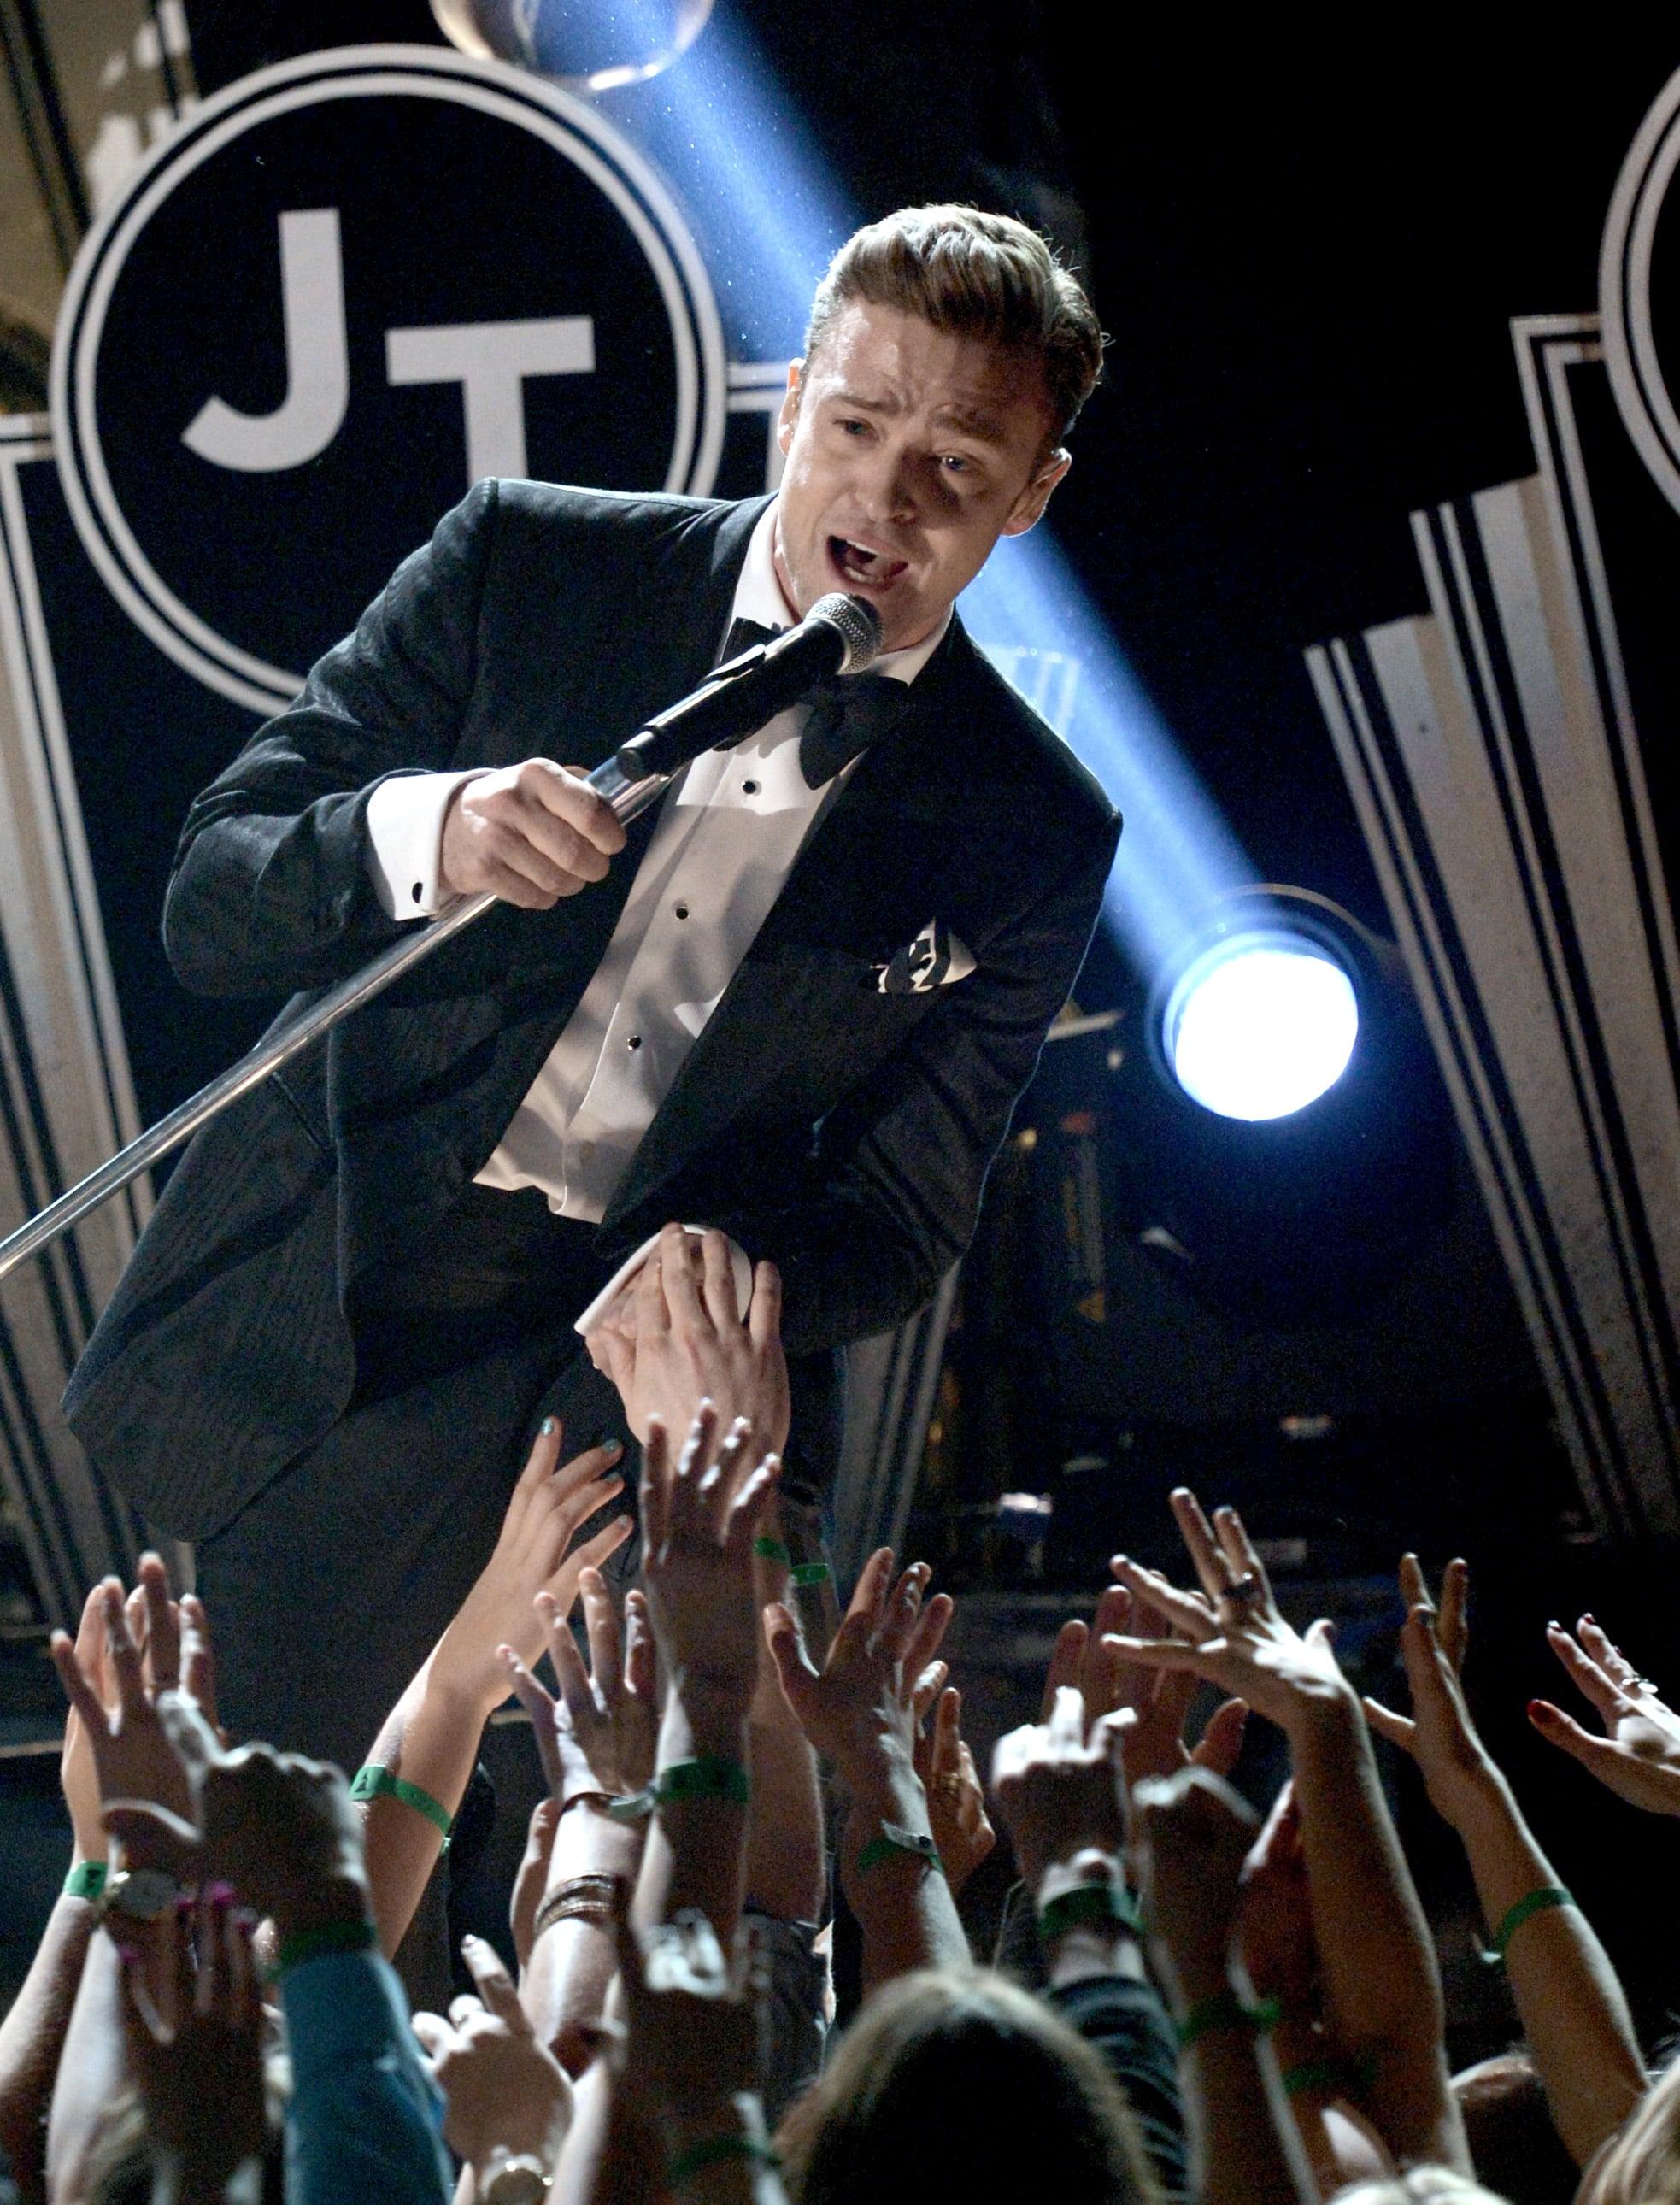 Justin Timberlake sang to the audience.